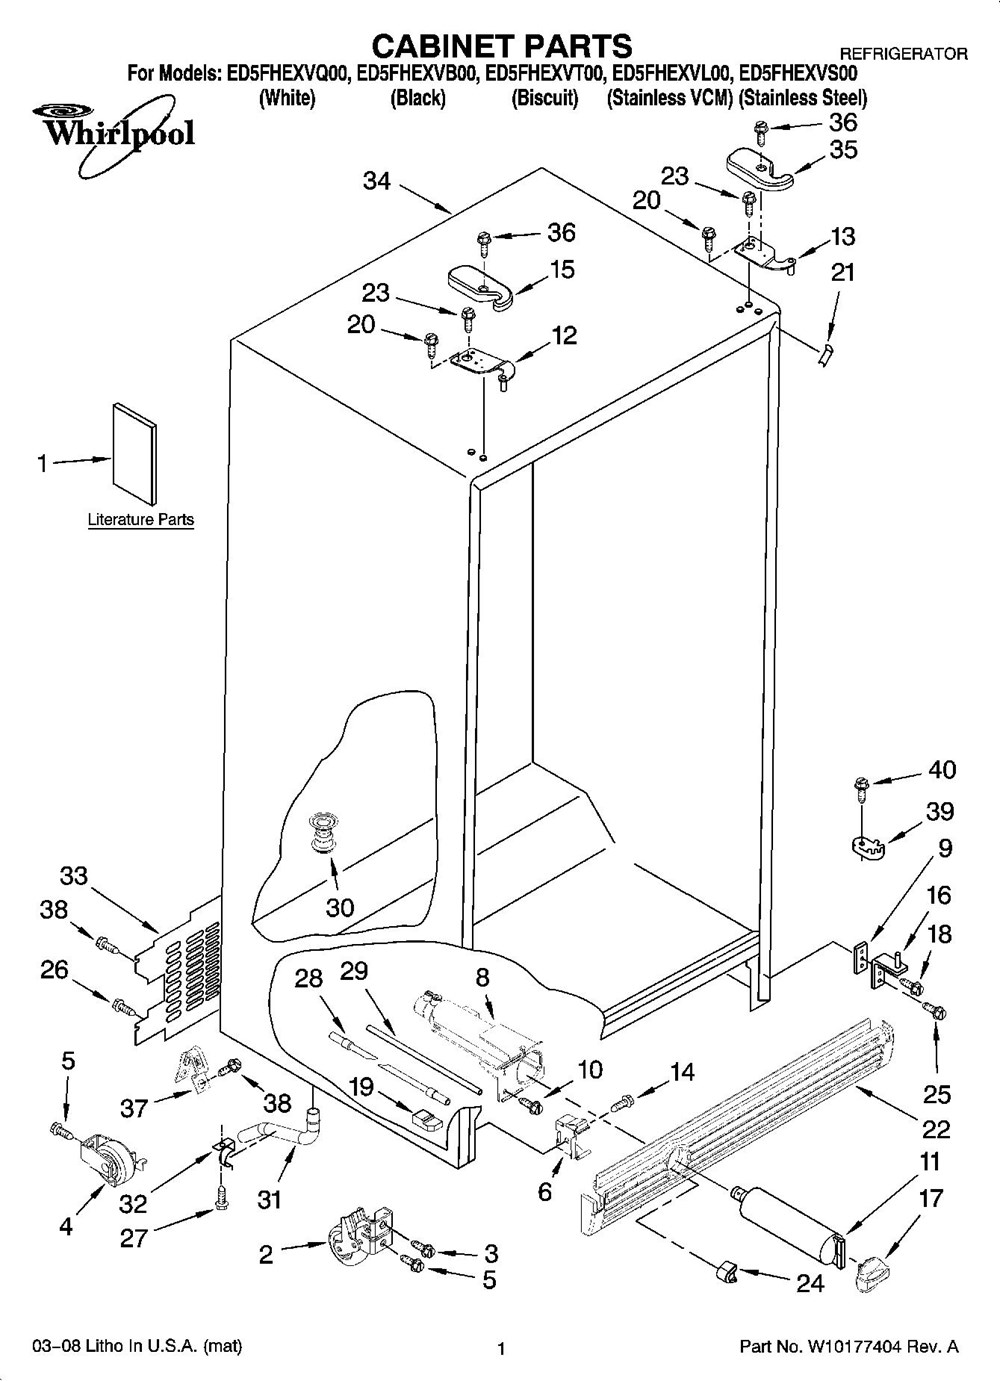 Whirlpool Appliances Wiring Diagram, Whirlpool, Free